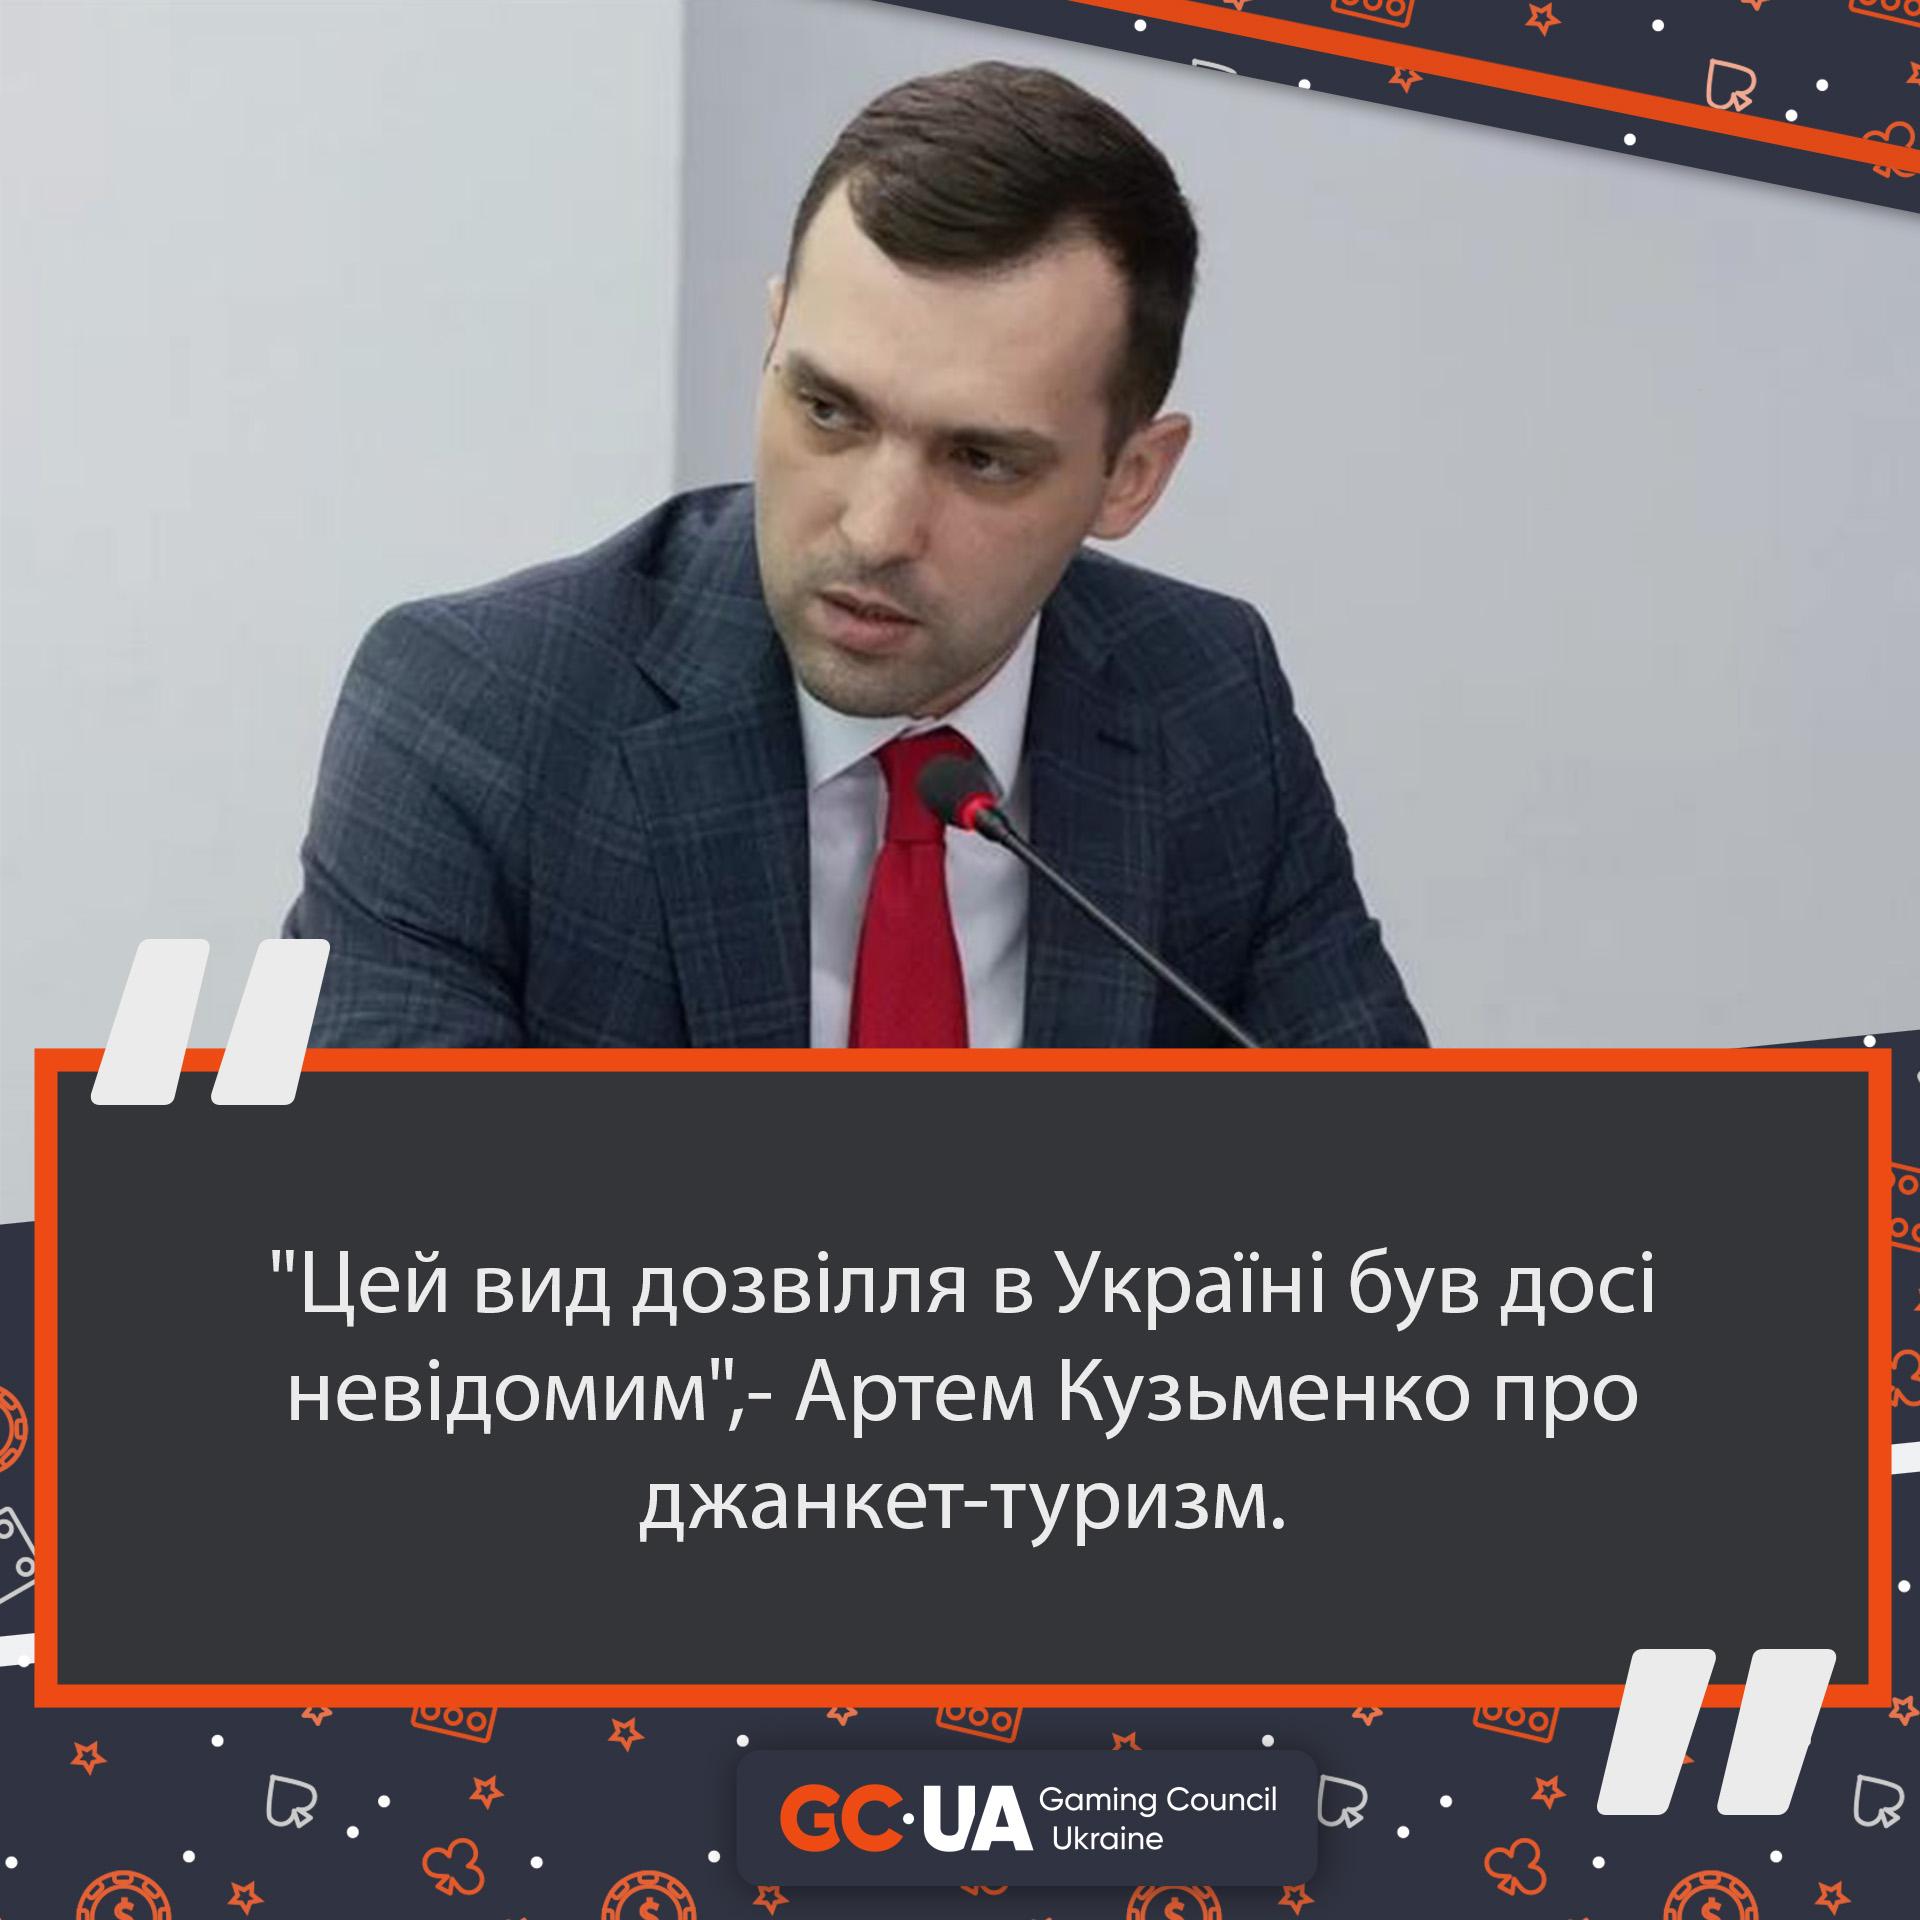 Джанкет-туризм стає дедалі популярнішим в Україні